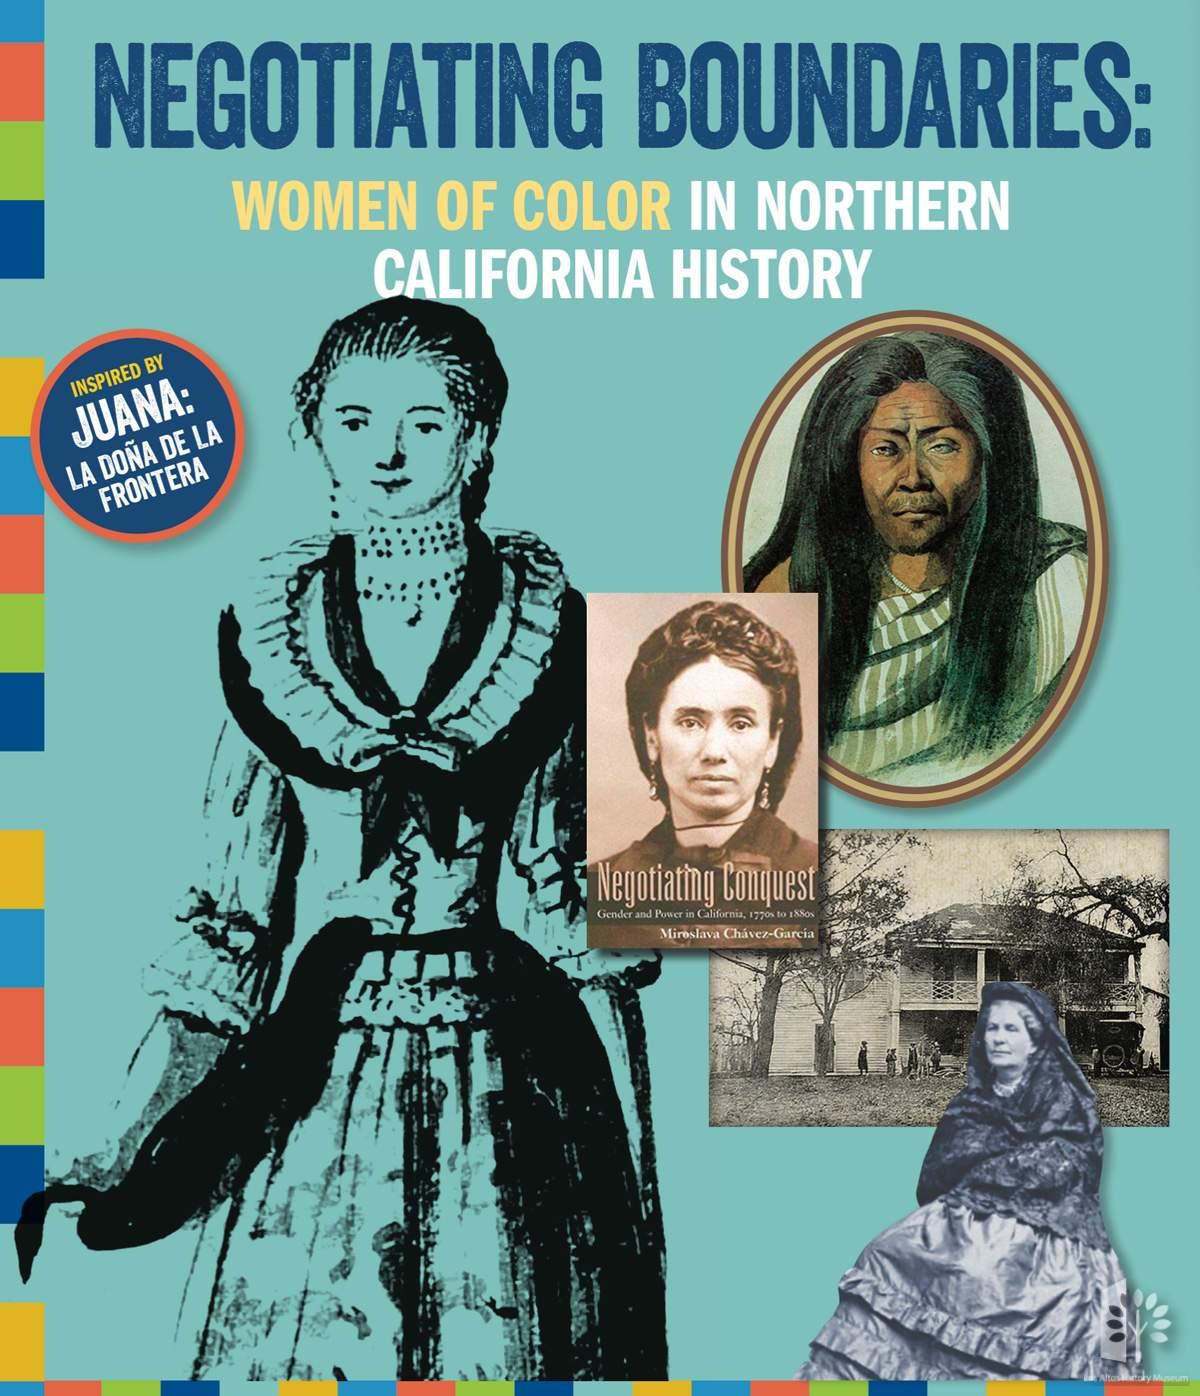 Symposium - Negotiating Boundaries: Women of Color in Northern California History